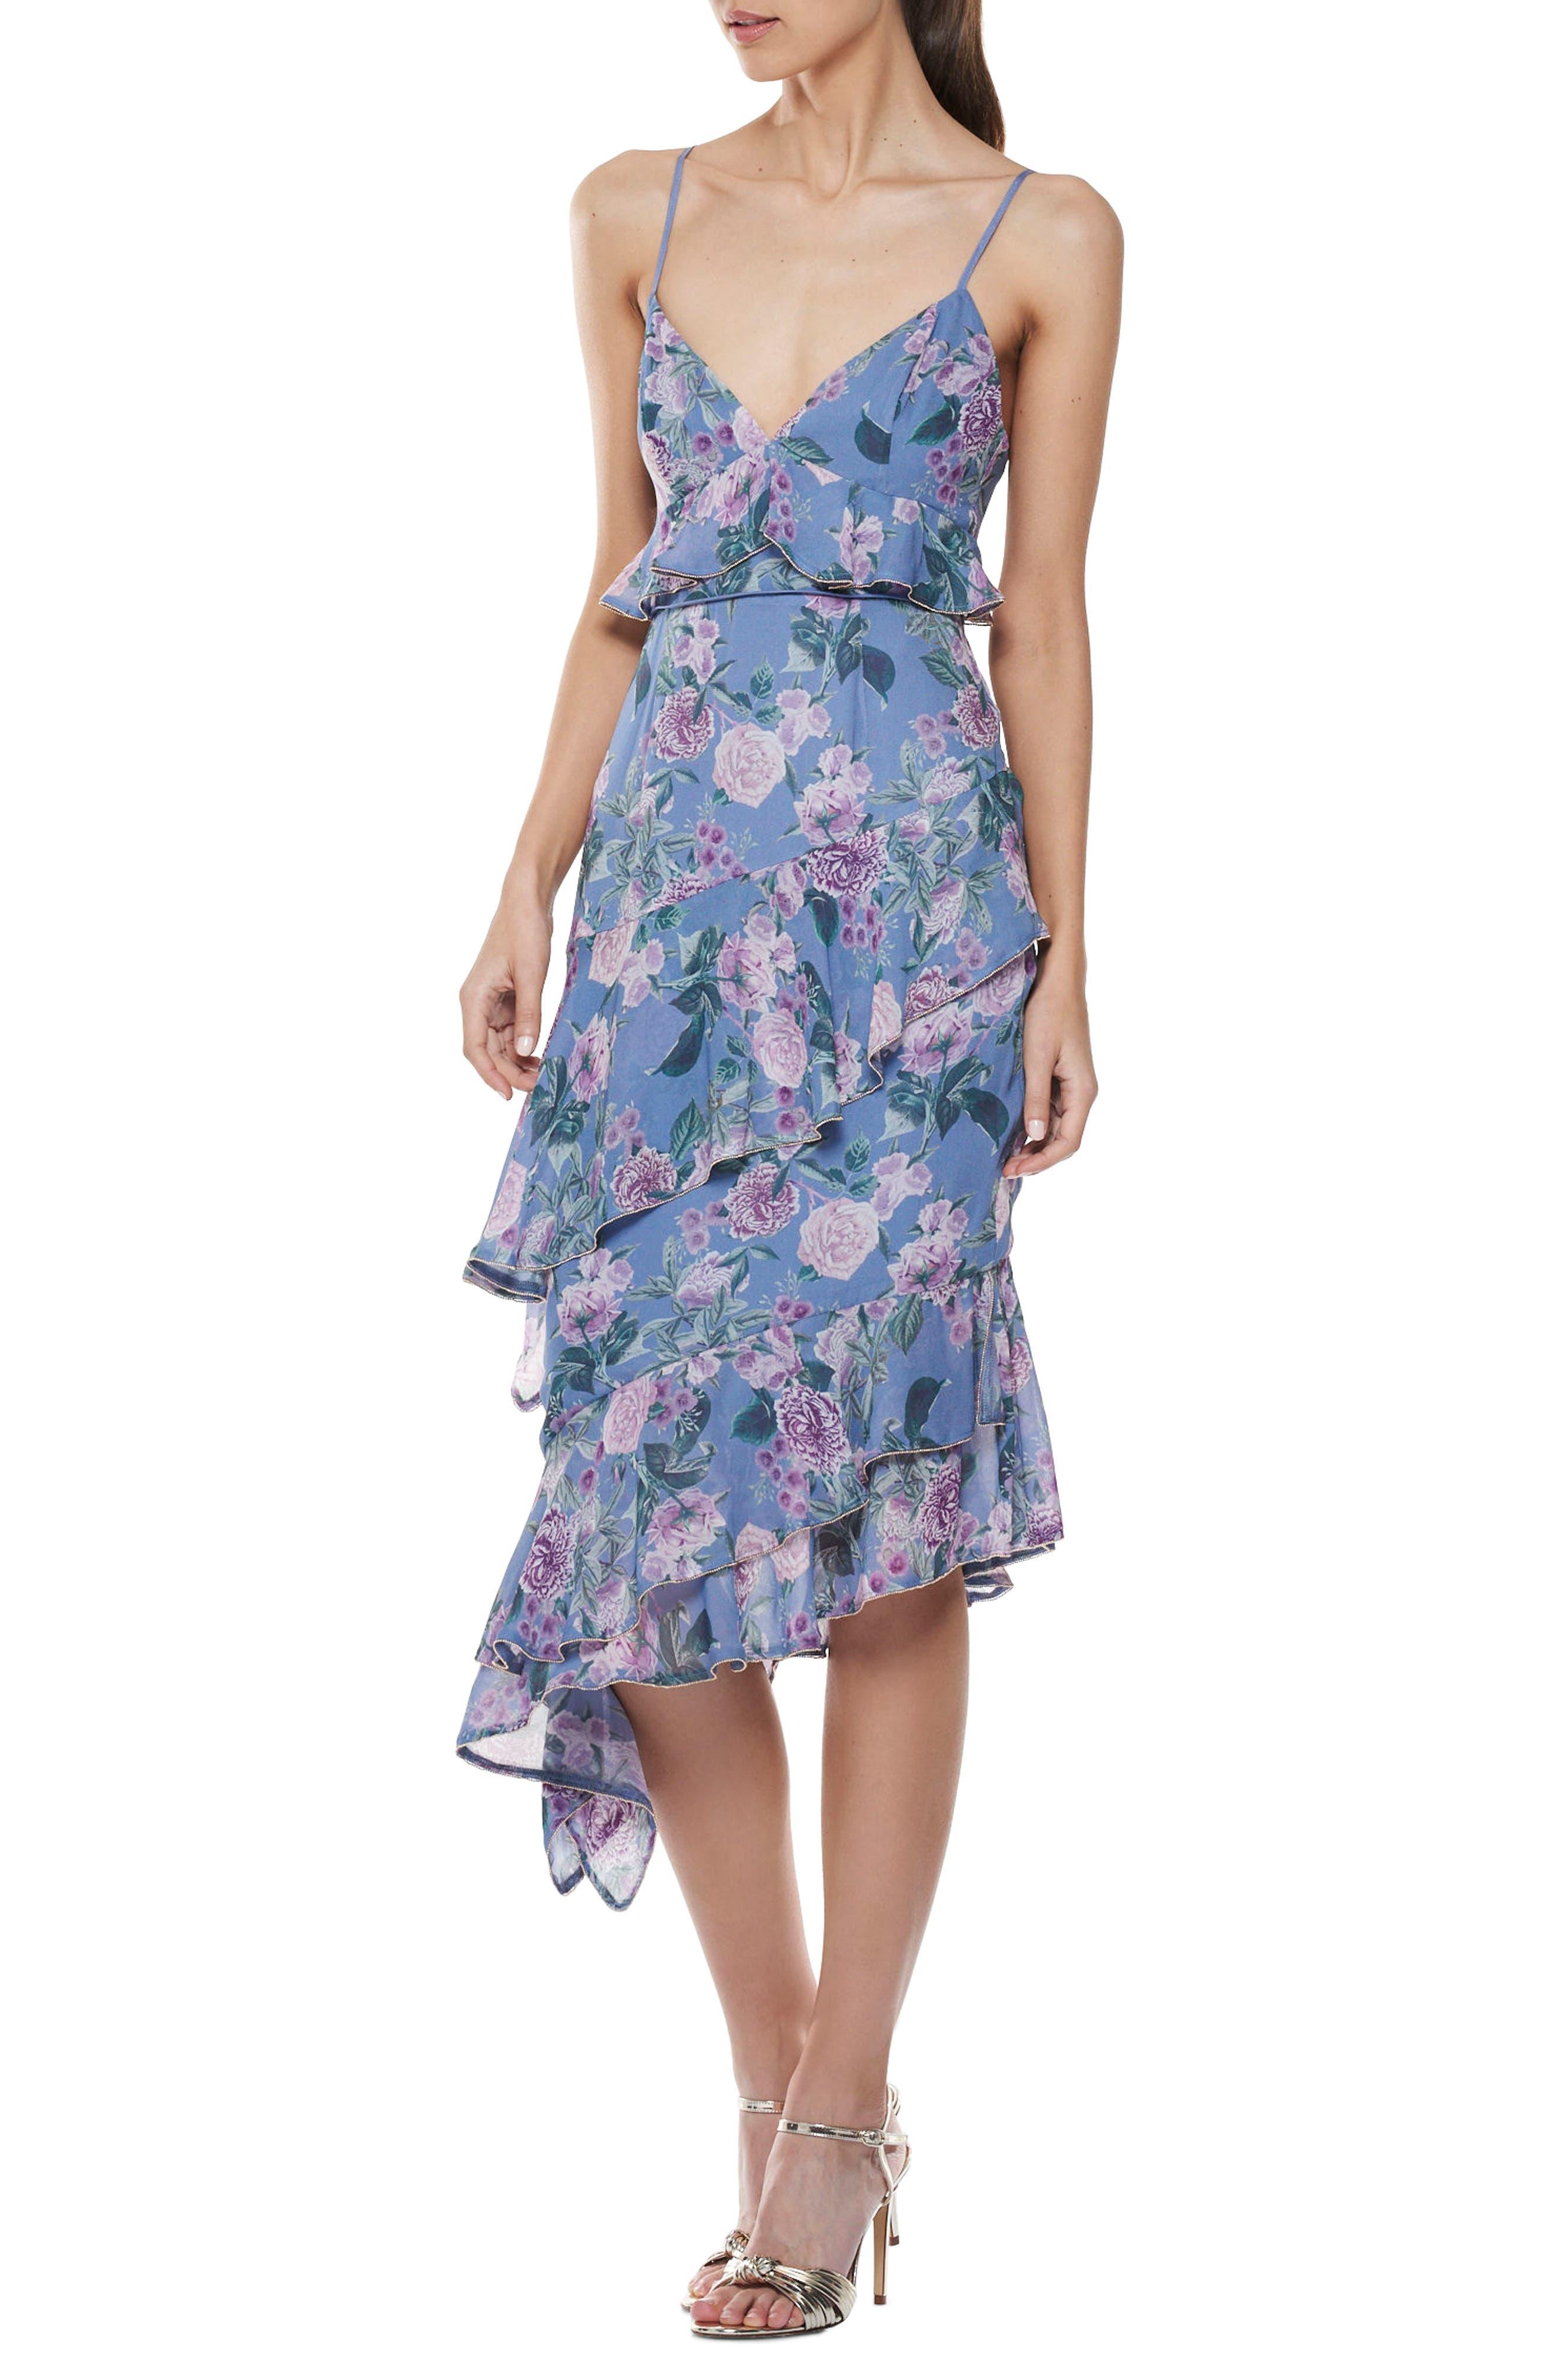 Here & Now Asymmetric Midi Dress,                         Main,                         color, Print